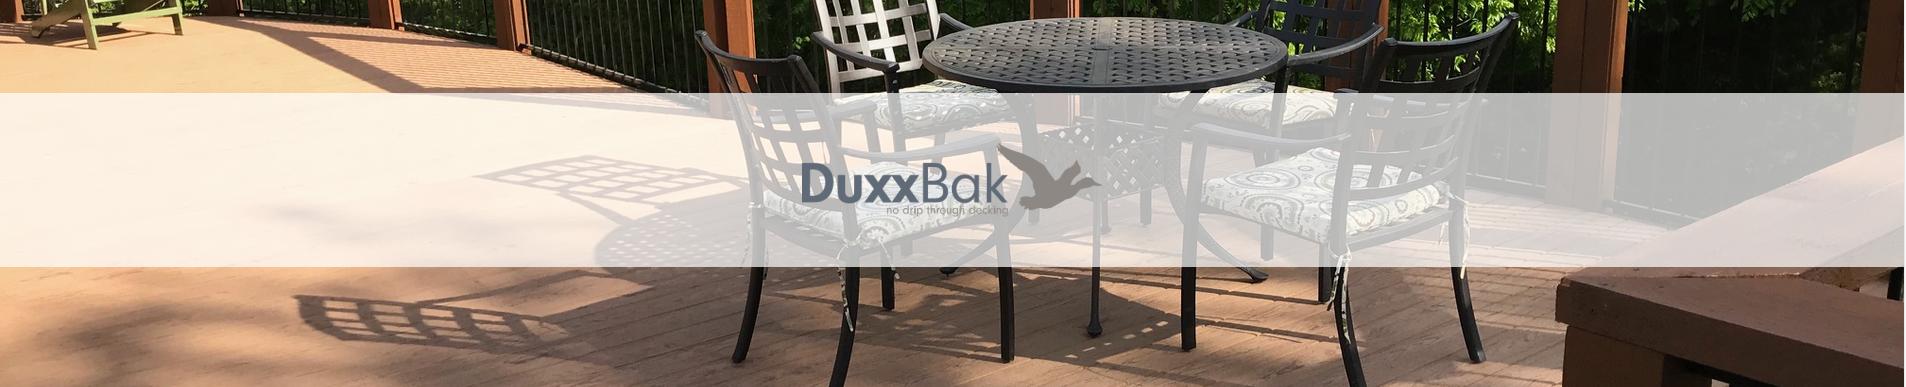 DuxxBak Composite Decking System